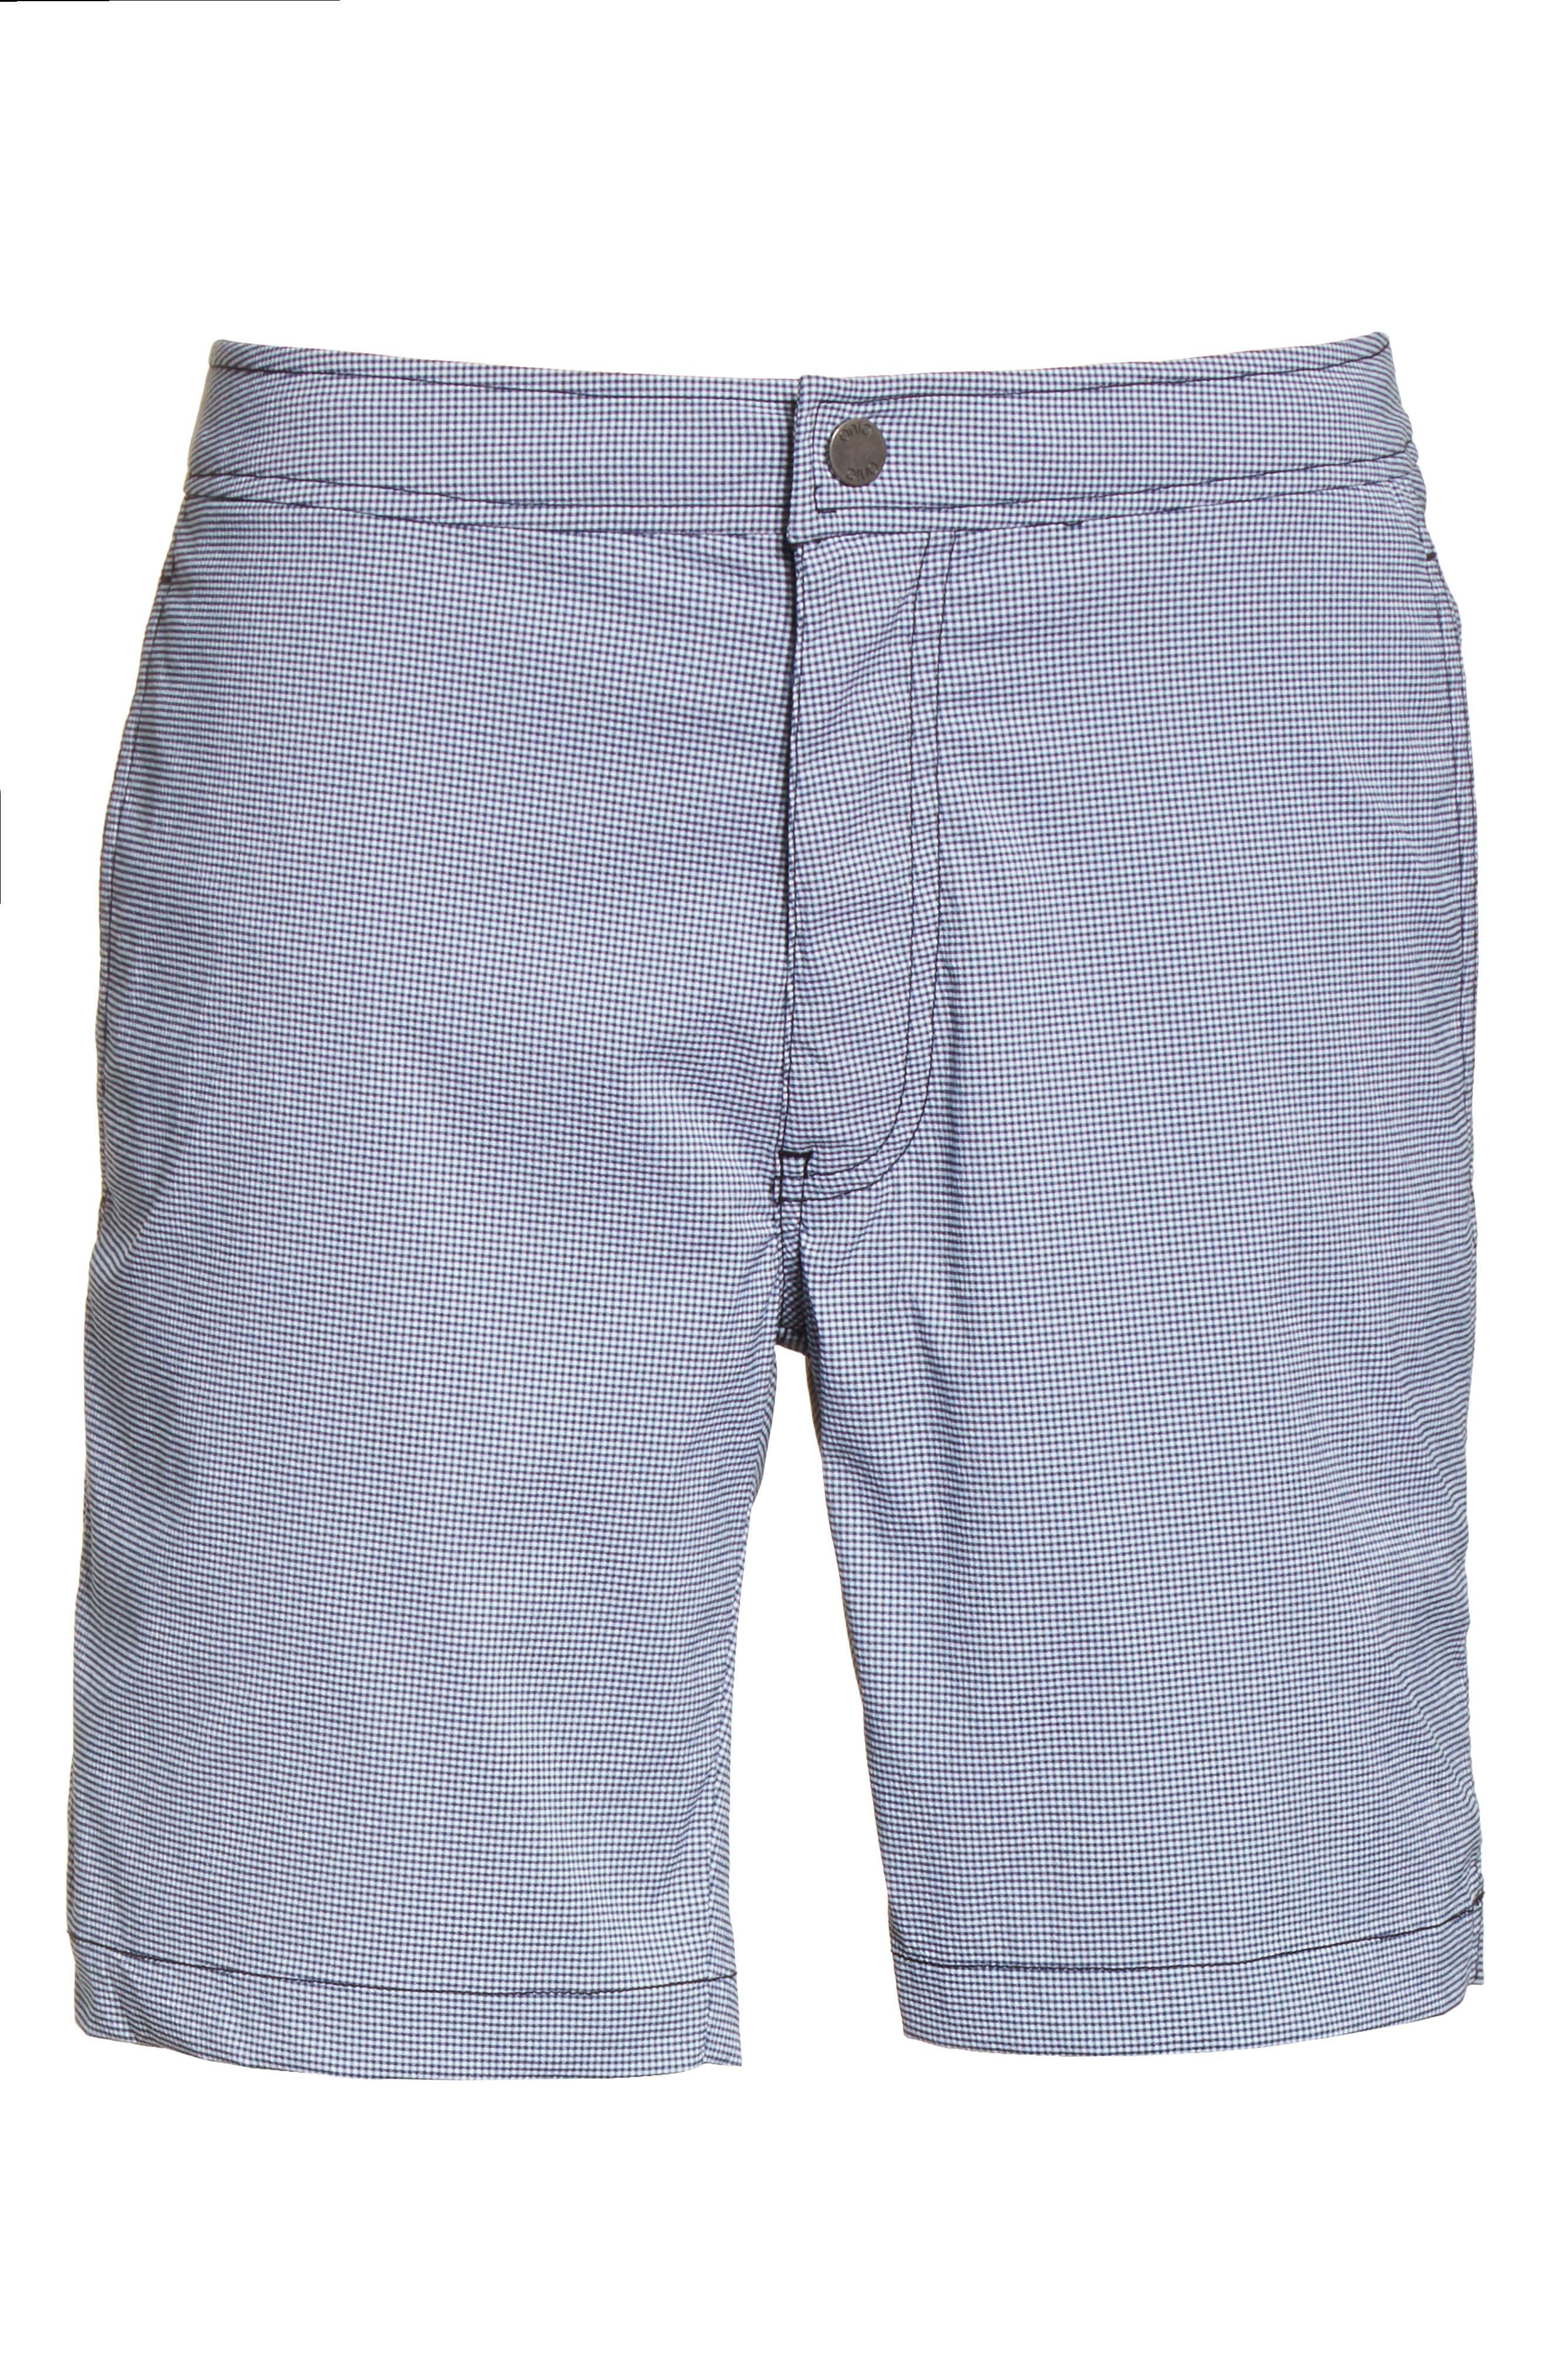 Calder Gingham Board Shorts,                             Alternate thumbnail 6, color,                             DEEP NAVY/WHITE